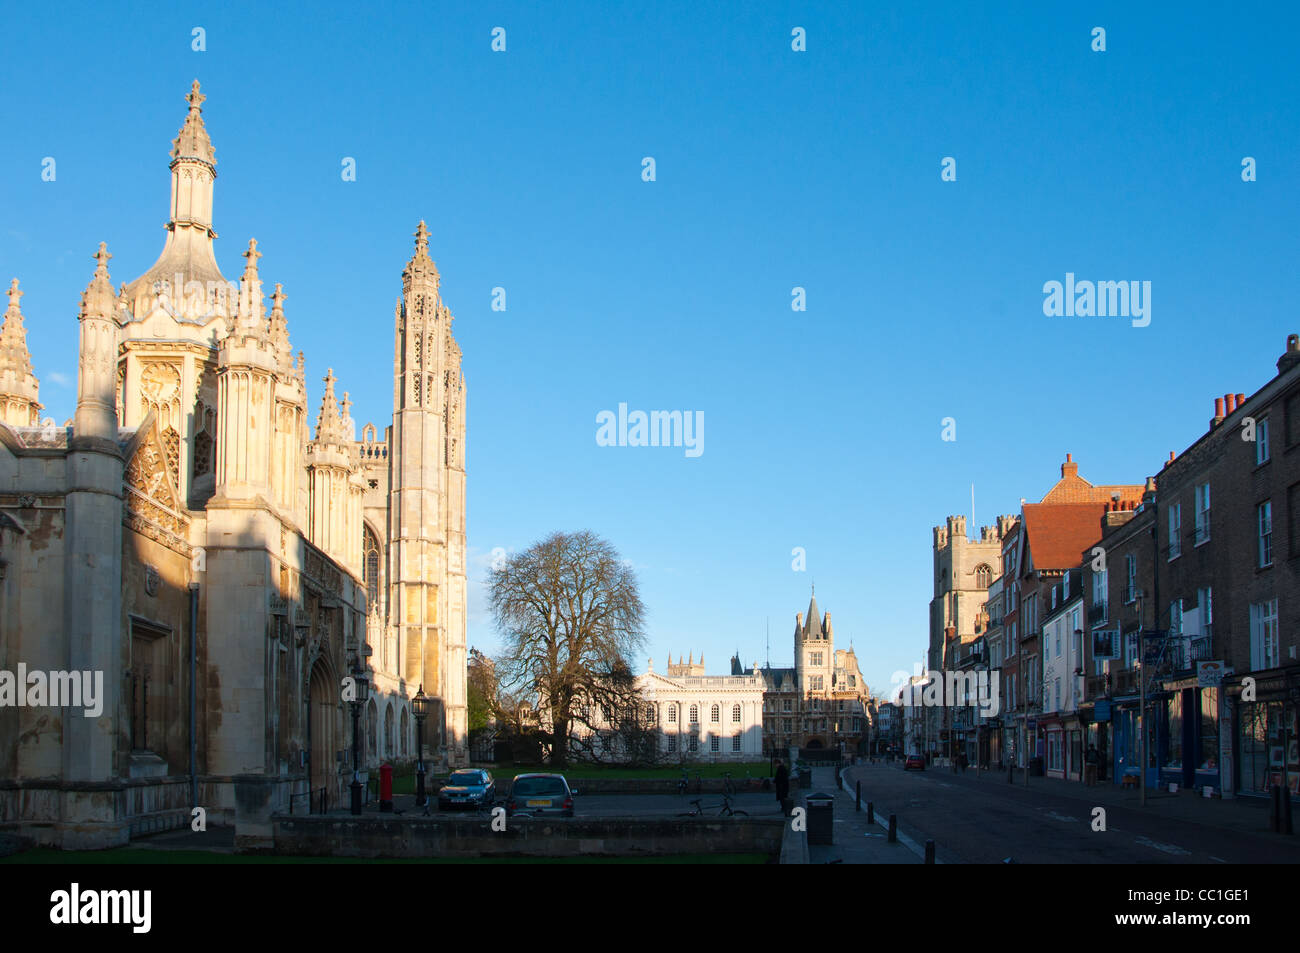 King parade, Cambridge, England. - Stock Image